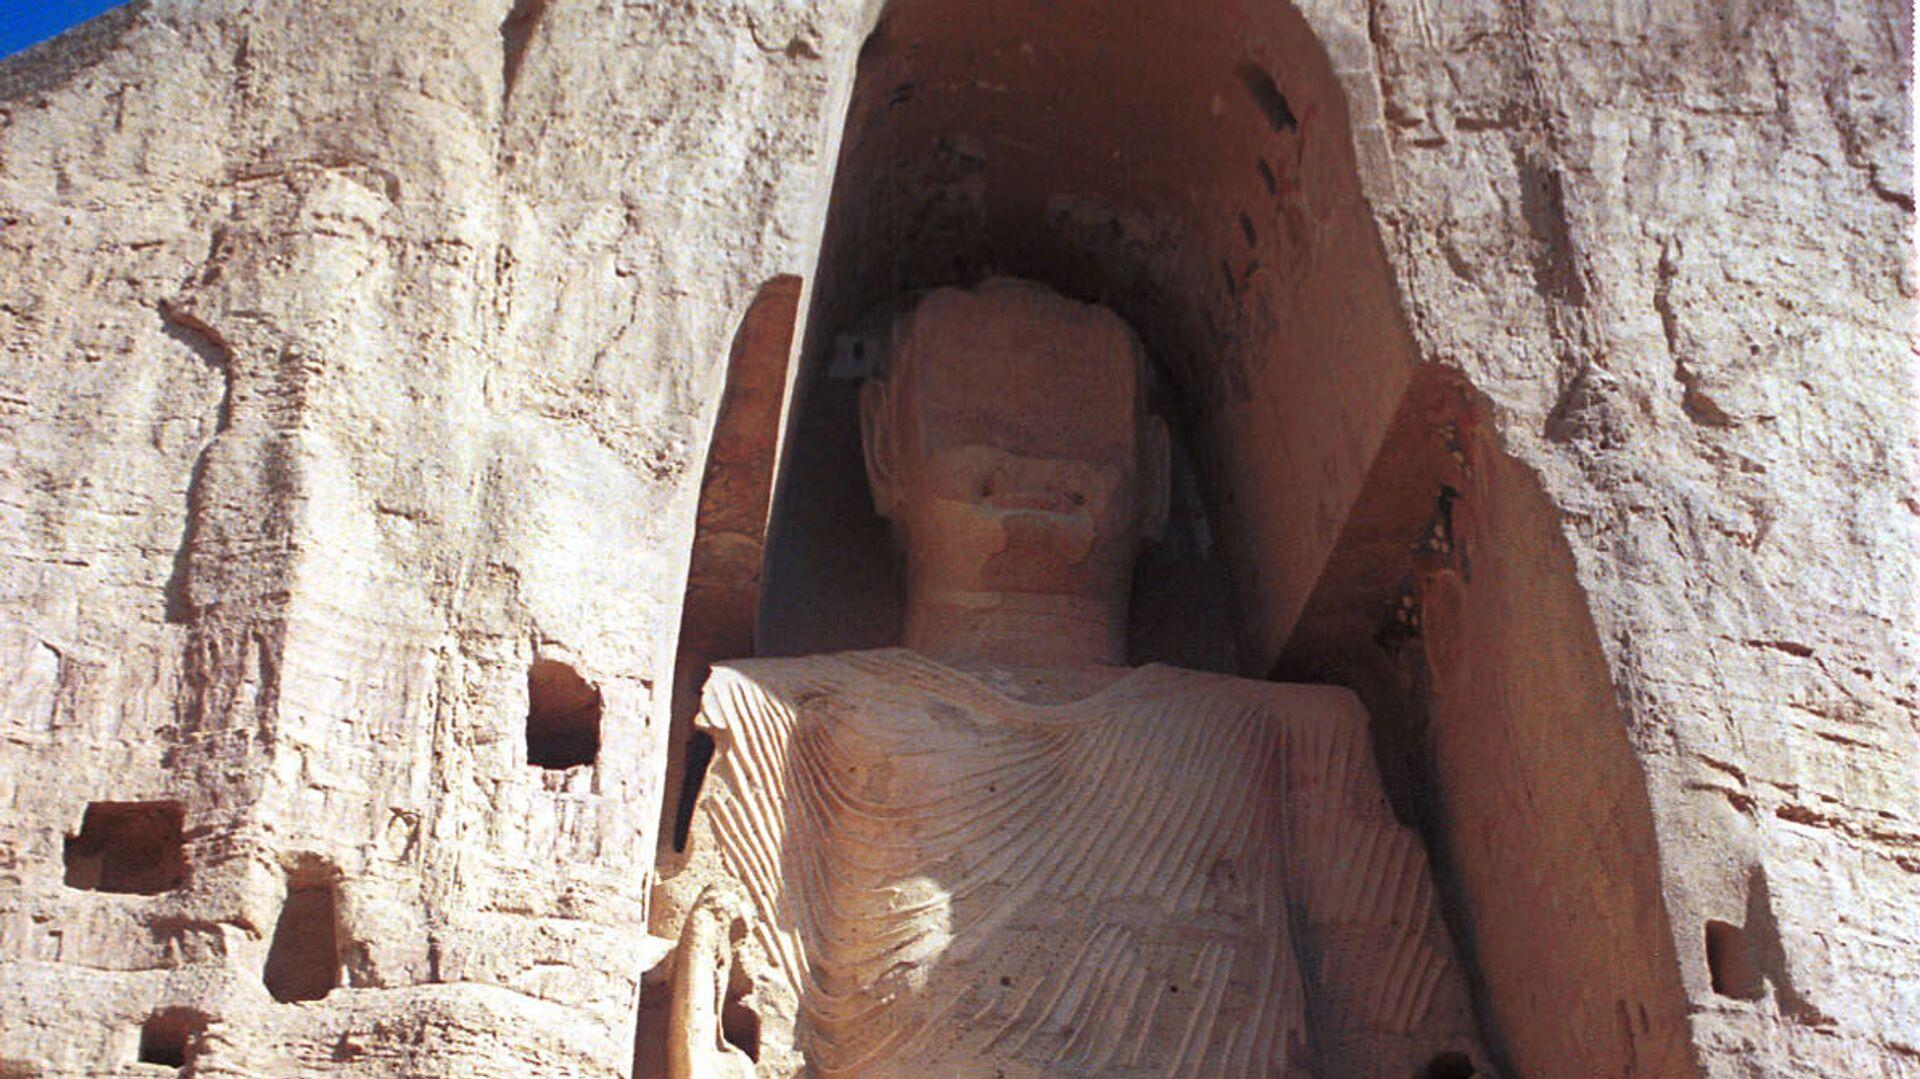 Statua di Buddha, alta 53 metri, nei pressi di Kabul, distrutta dai talebani nel 2001 - Sputnik Italia, 1920, 29.08.2021